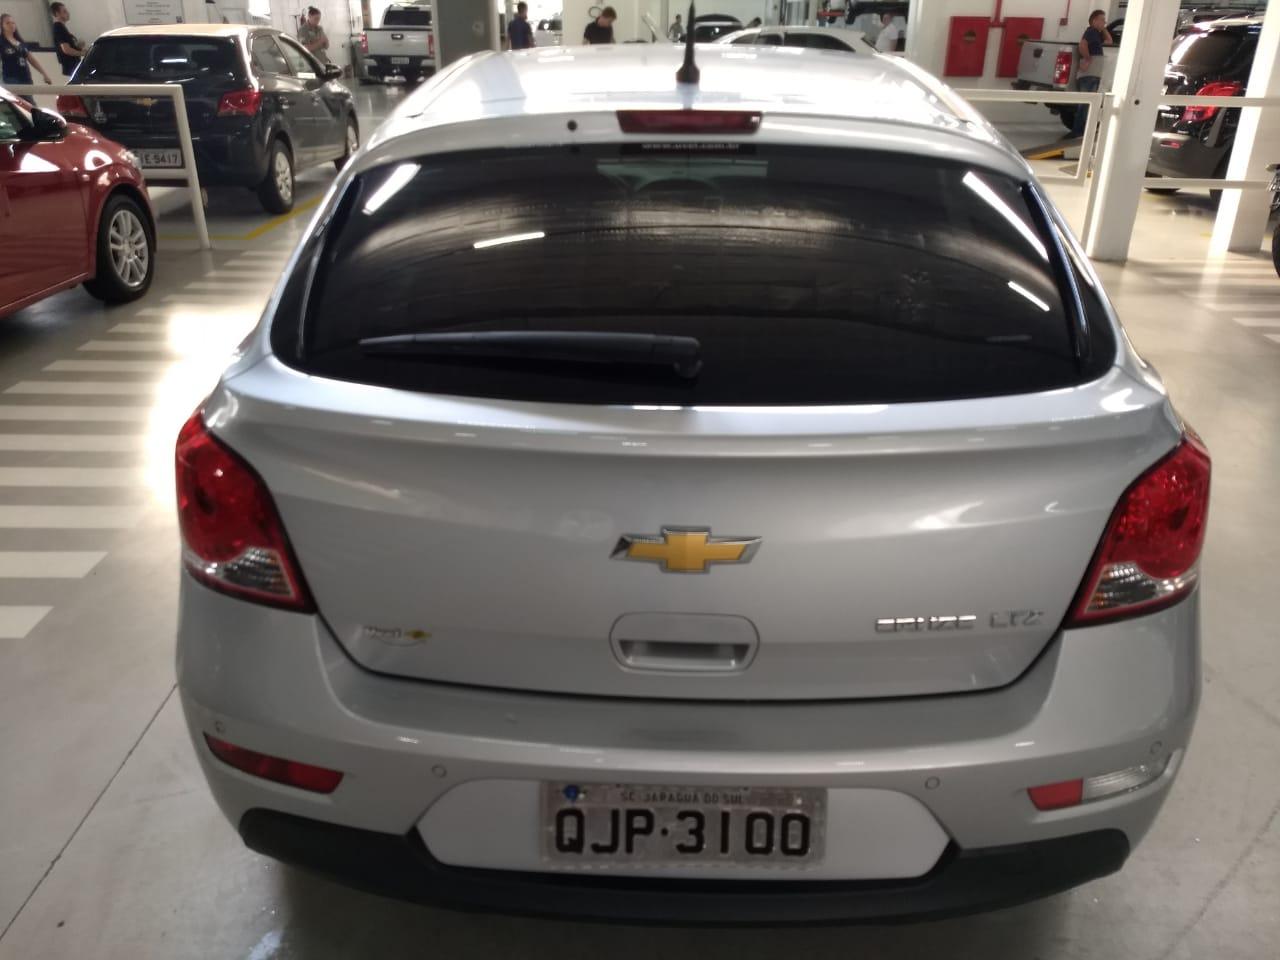 Chevrolet Cruze LTZ 1.8L 2016